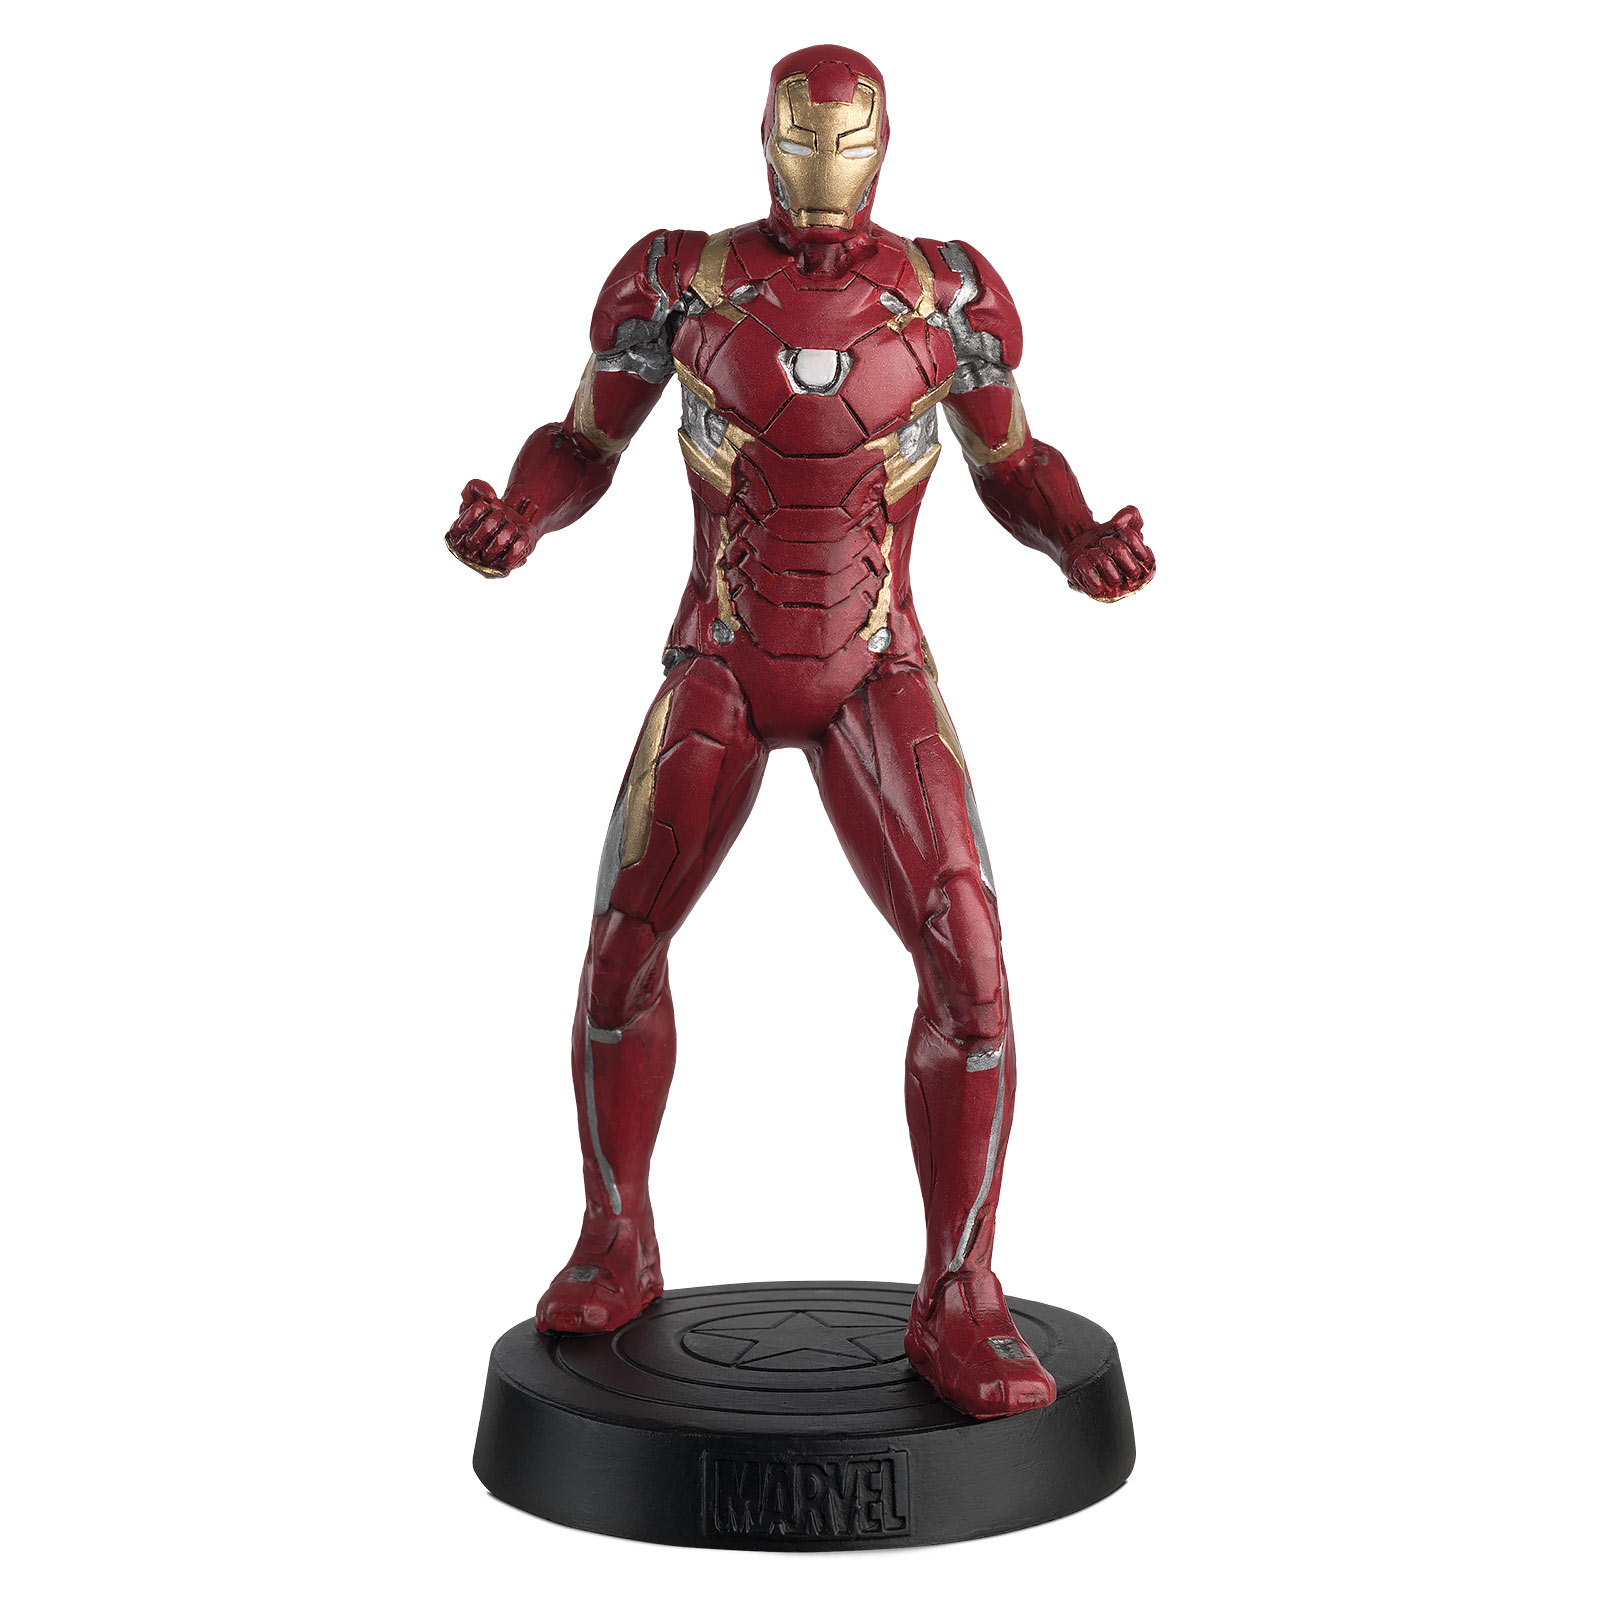 Iron Man Hero Collector Figur 13 cm